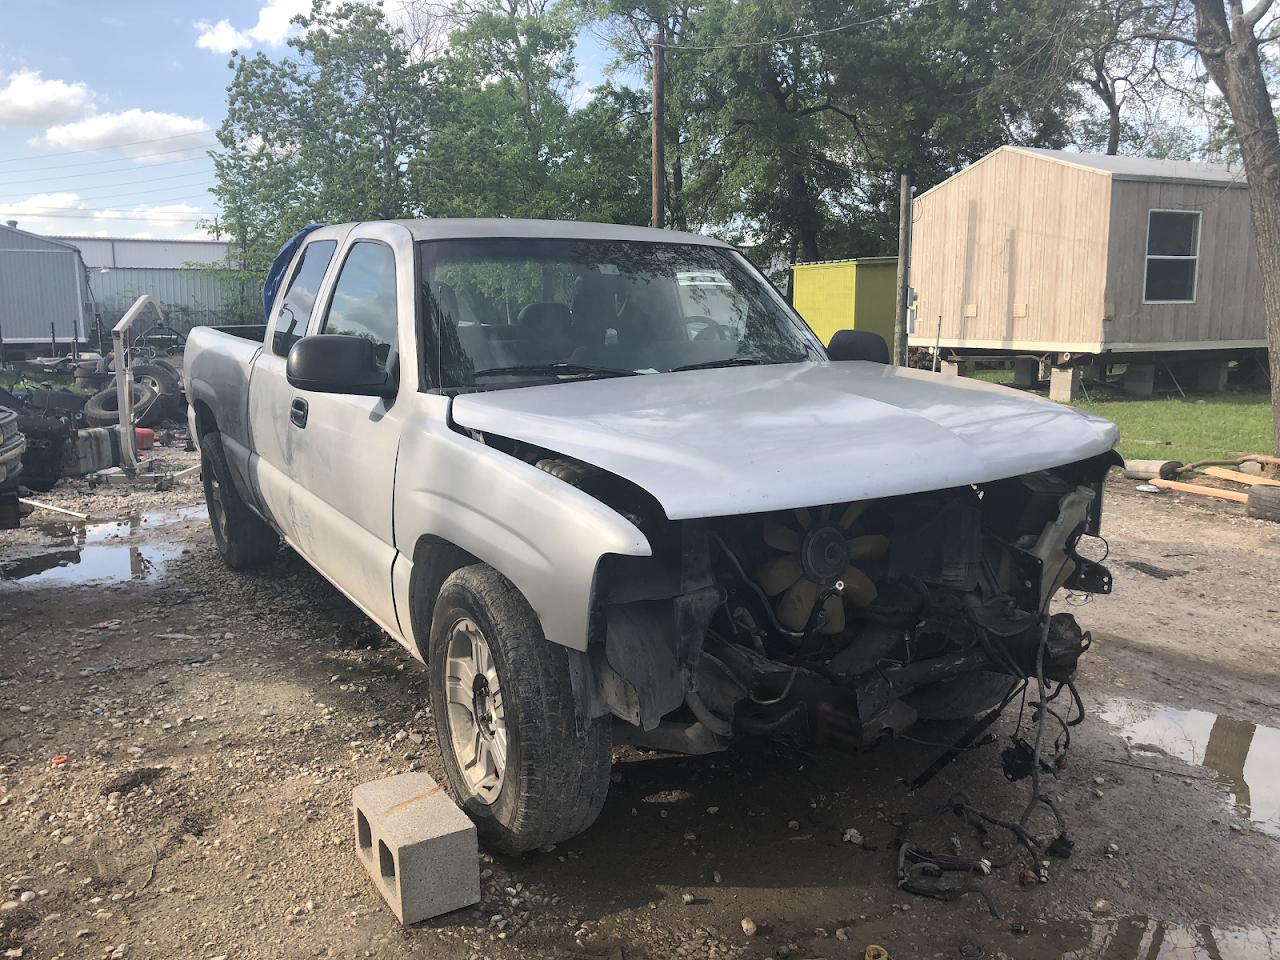 Junk Cars Black Knight - Junk car buyer in Houston